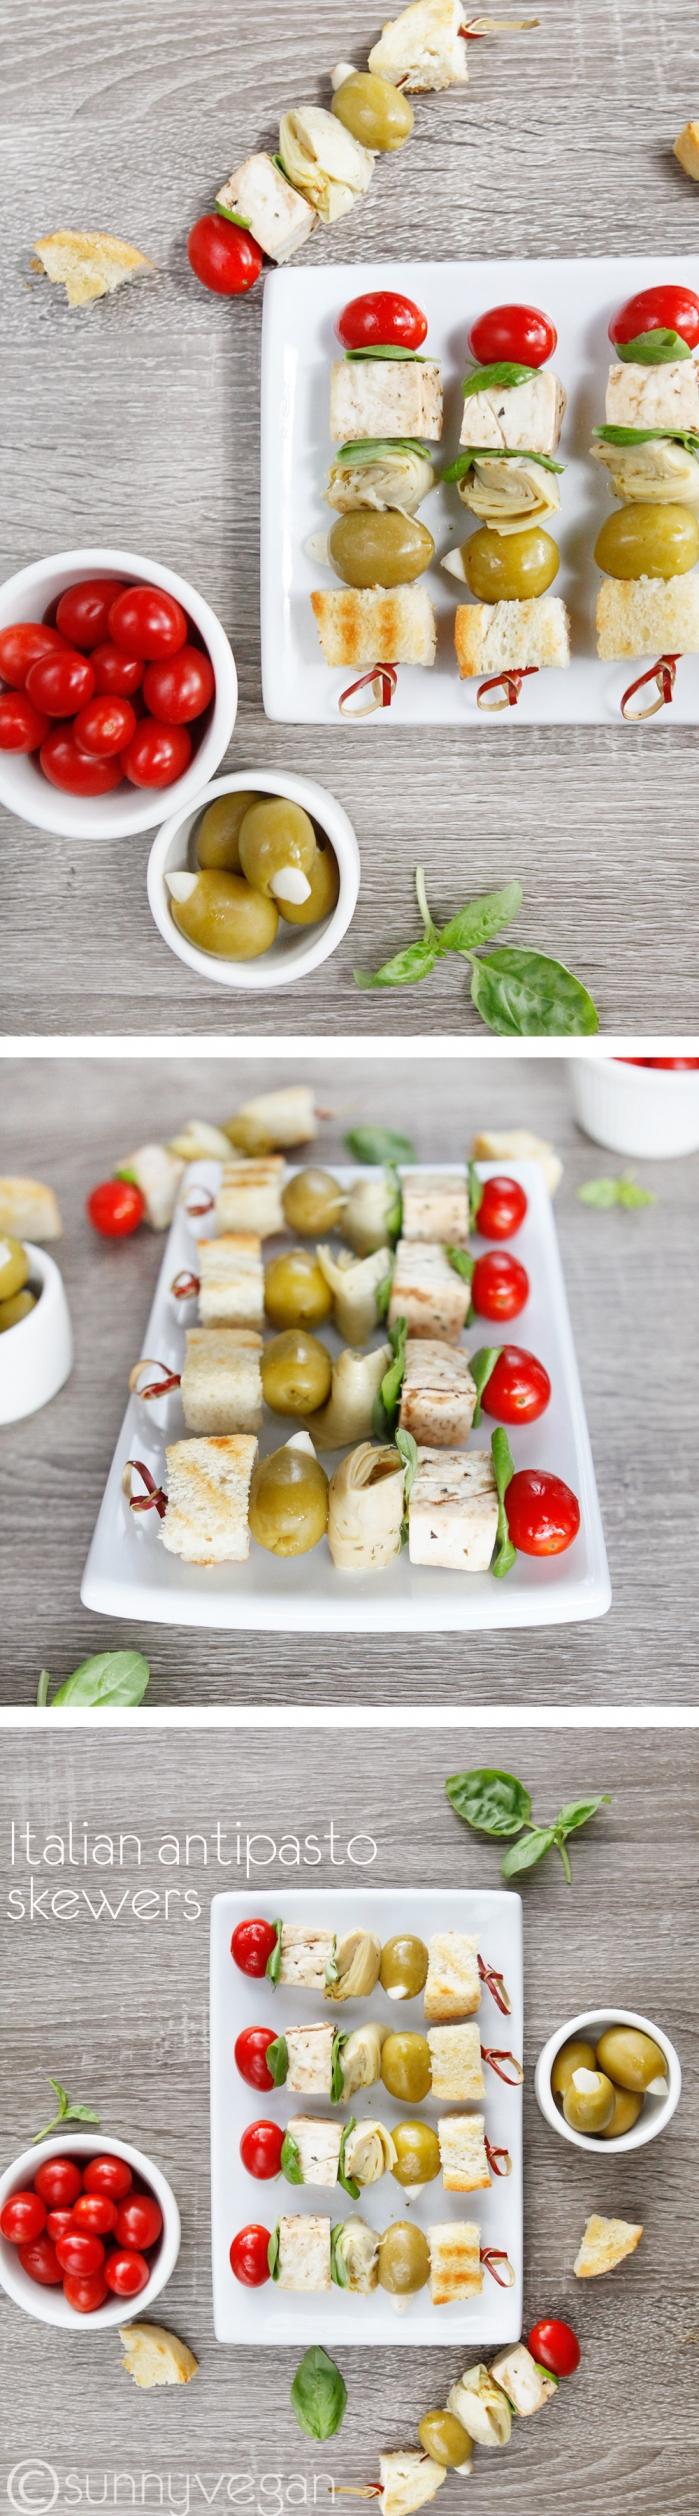 tailgate antipasto skewer recipe from sunny vegan